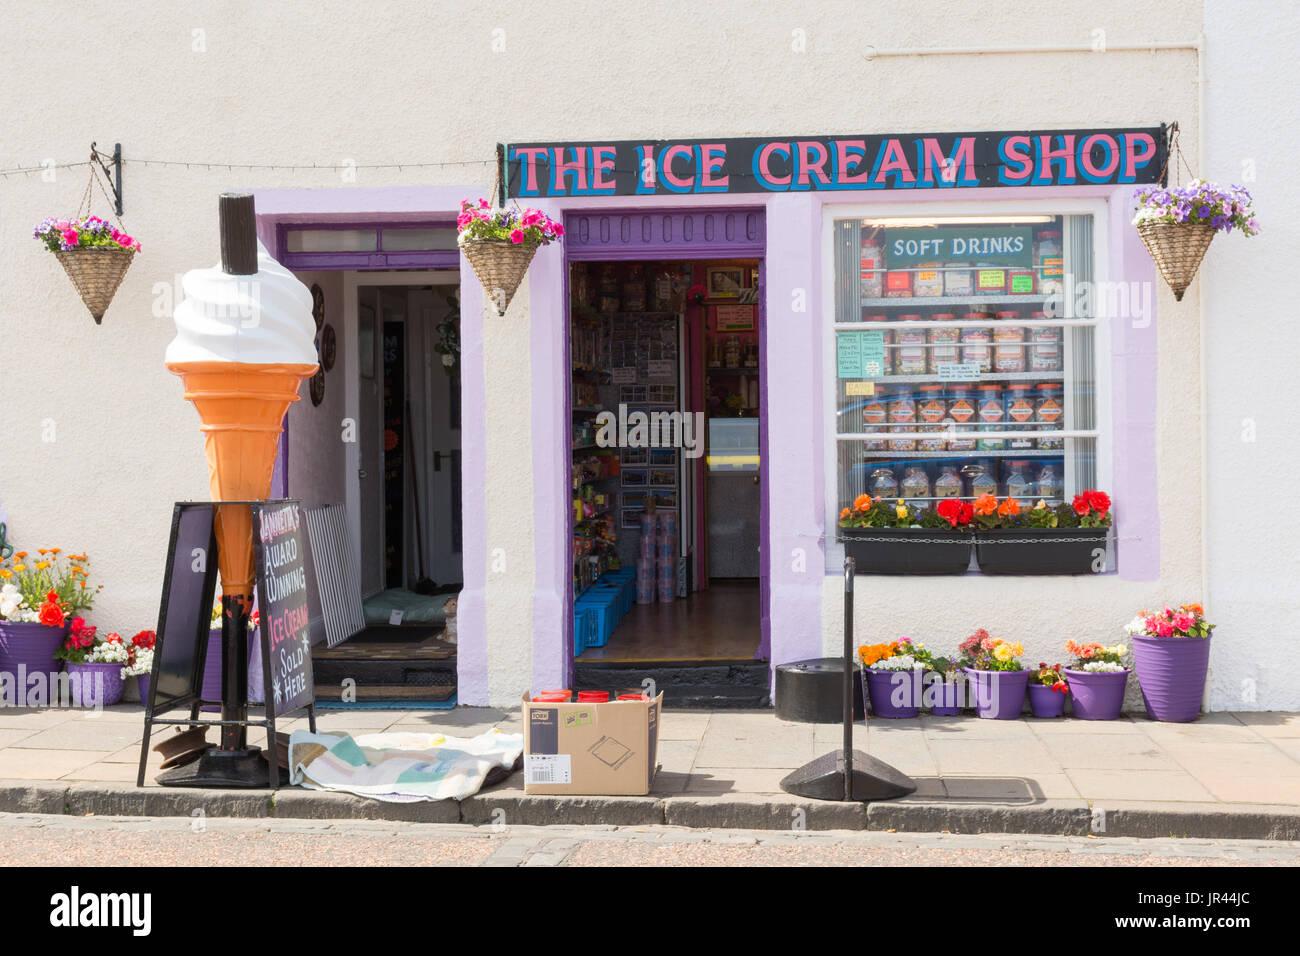 Pittenweem - The Ice Cream Shop - Fife, Scotland, UK - Stock Image